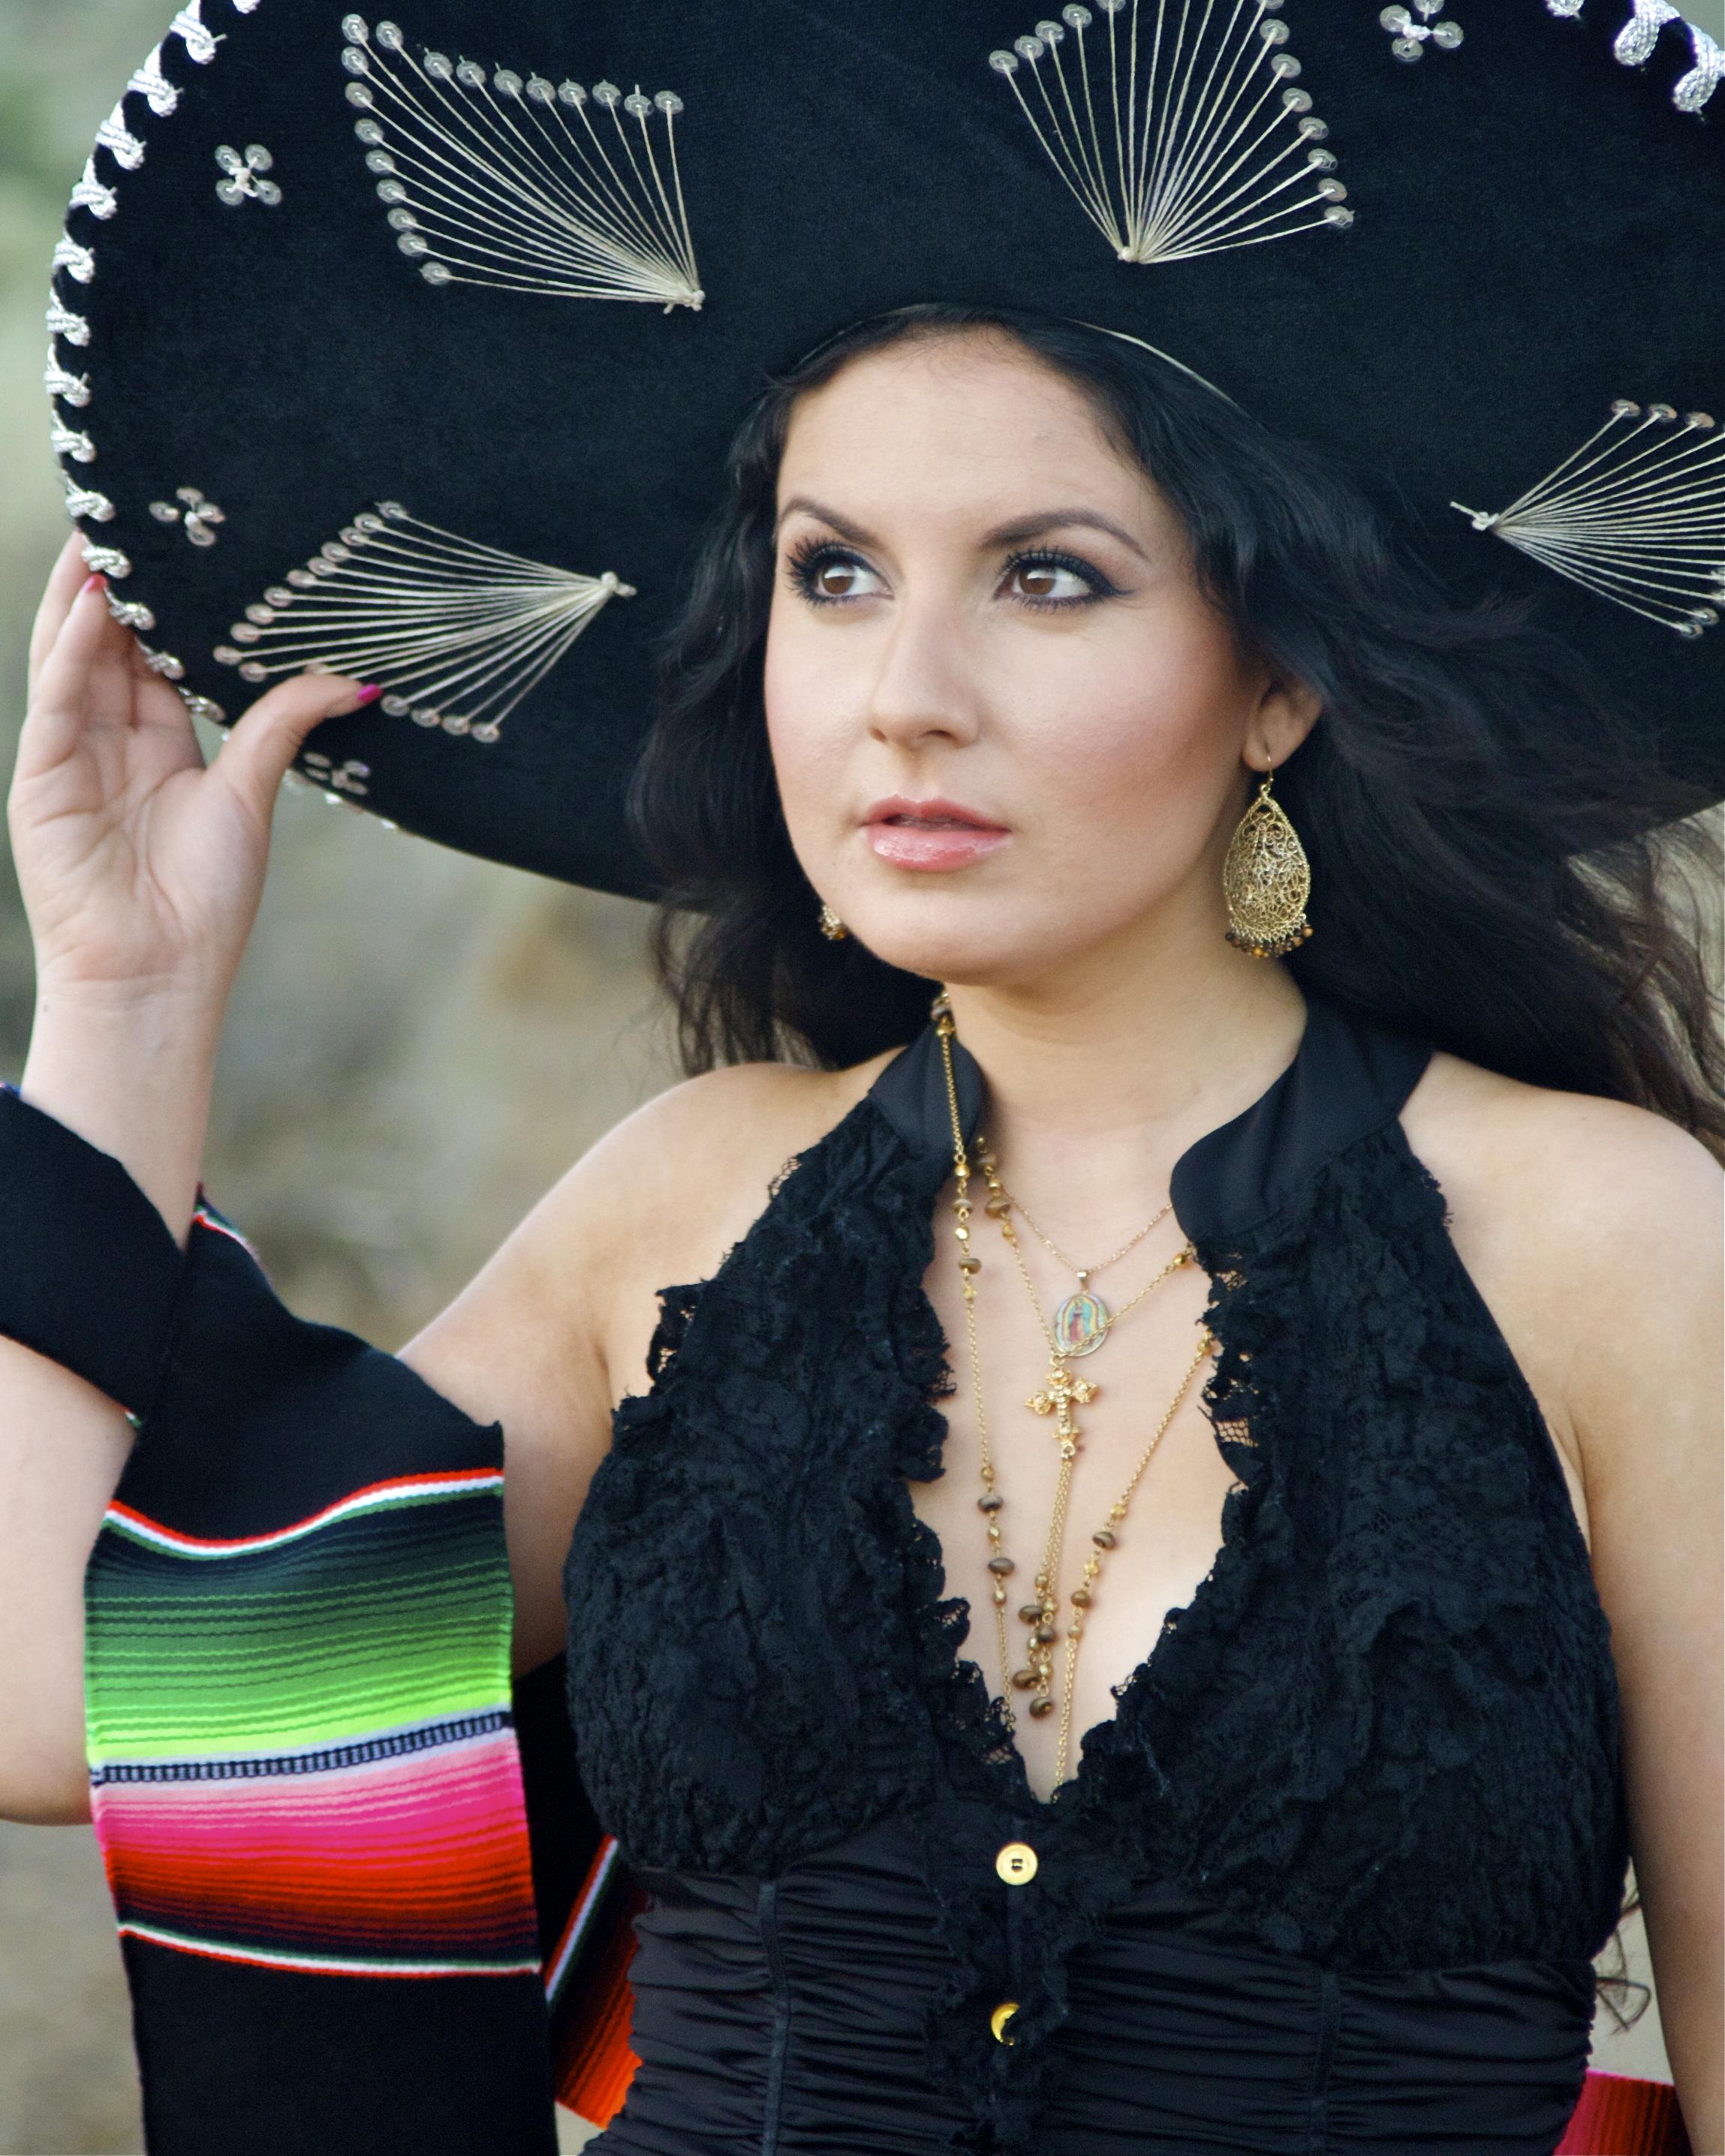 Latino Model Portrait